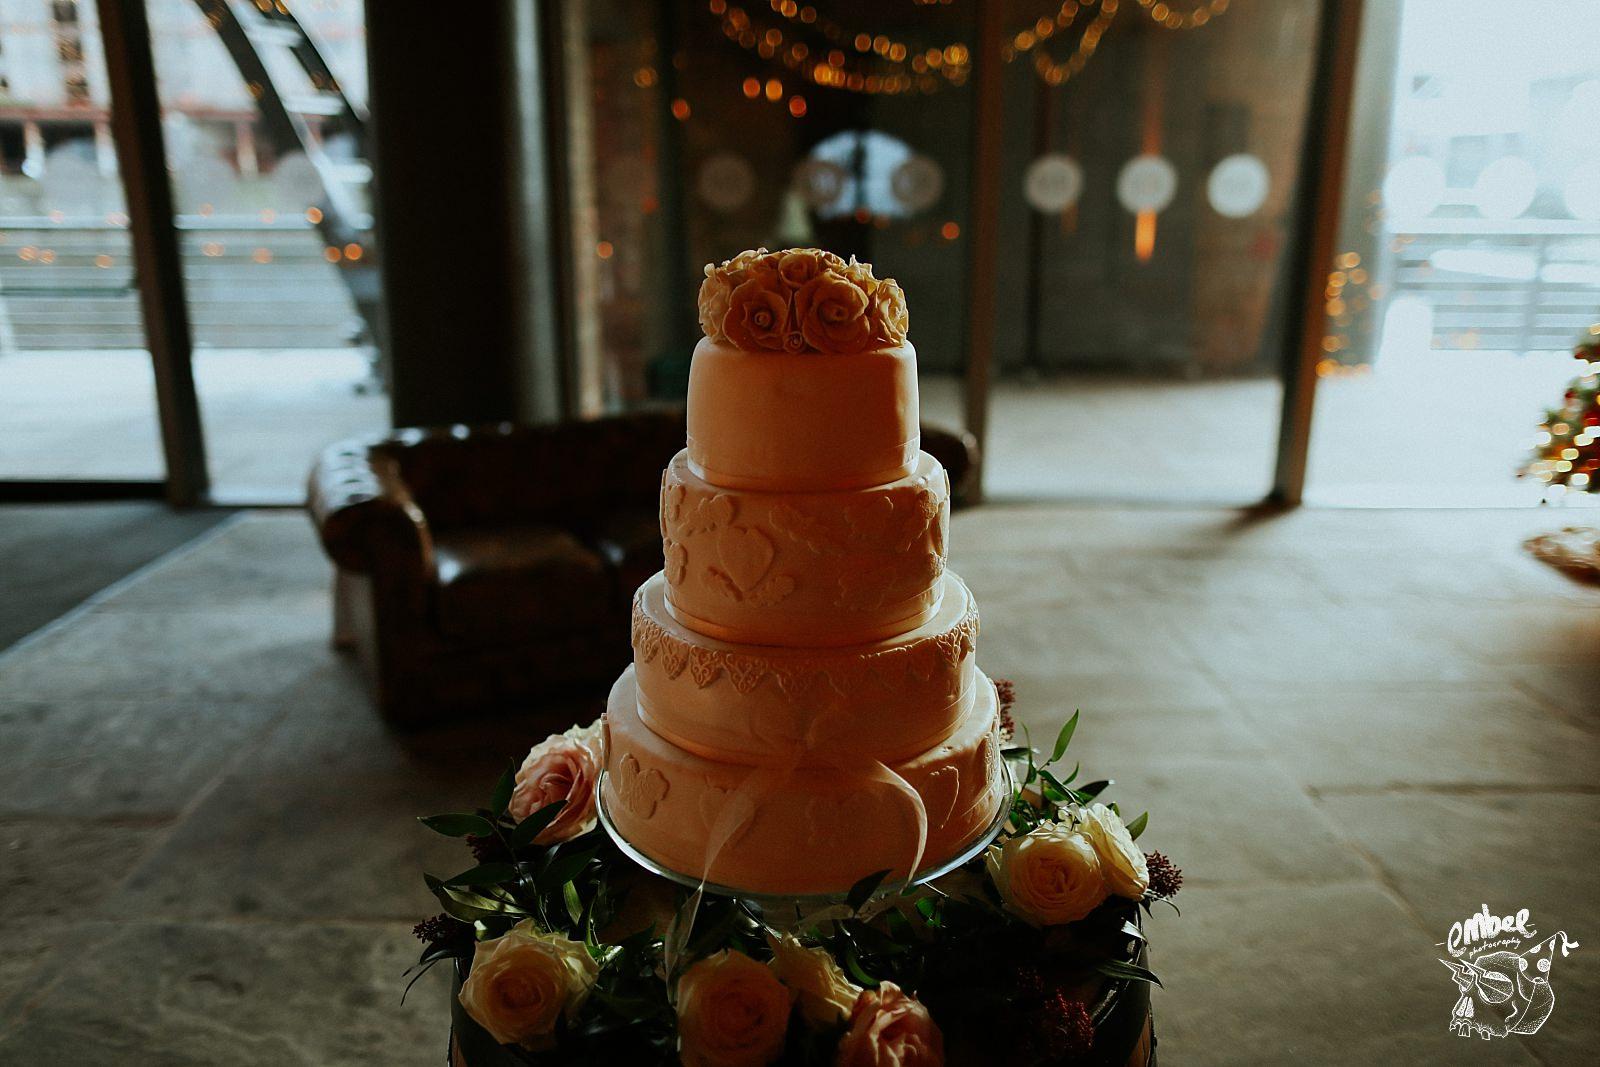 wedding cake being illuminated by a sunset